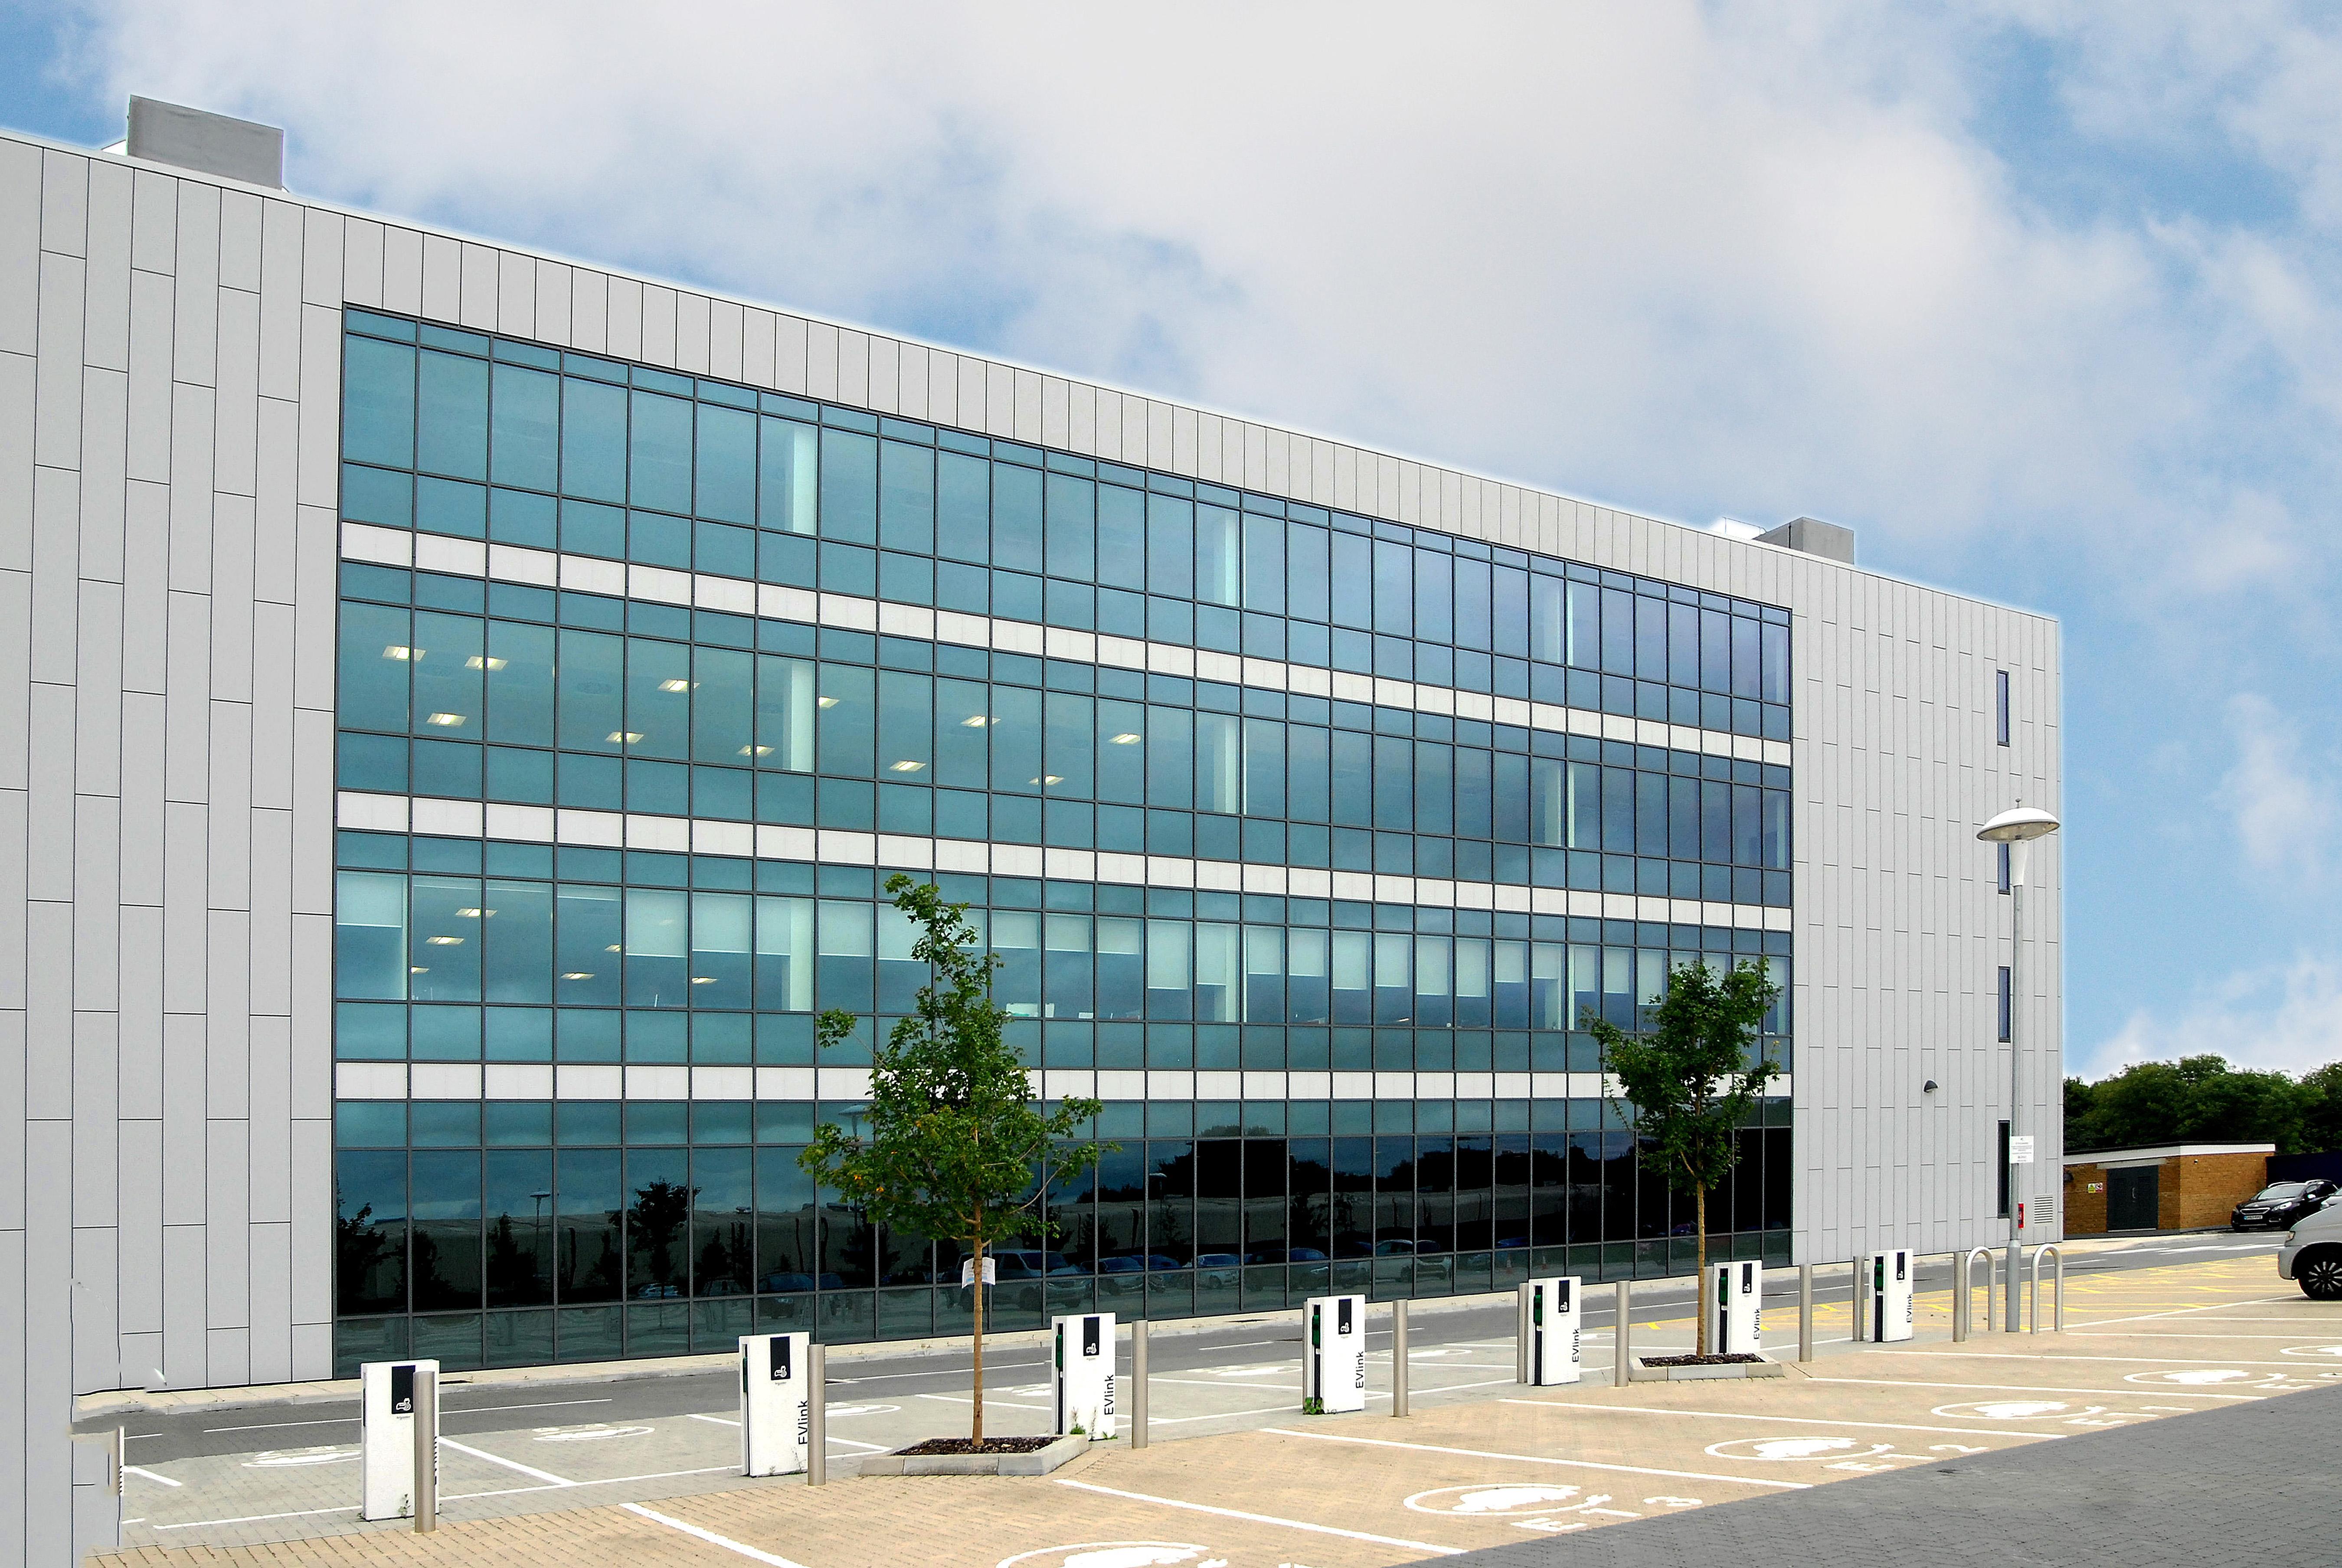 South East Coast Ambulance Headquarters